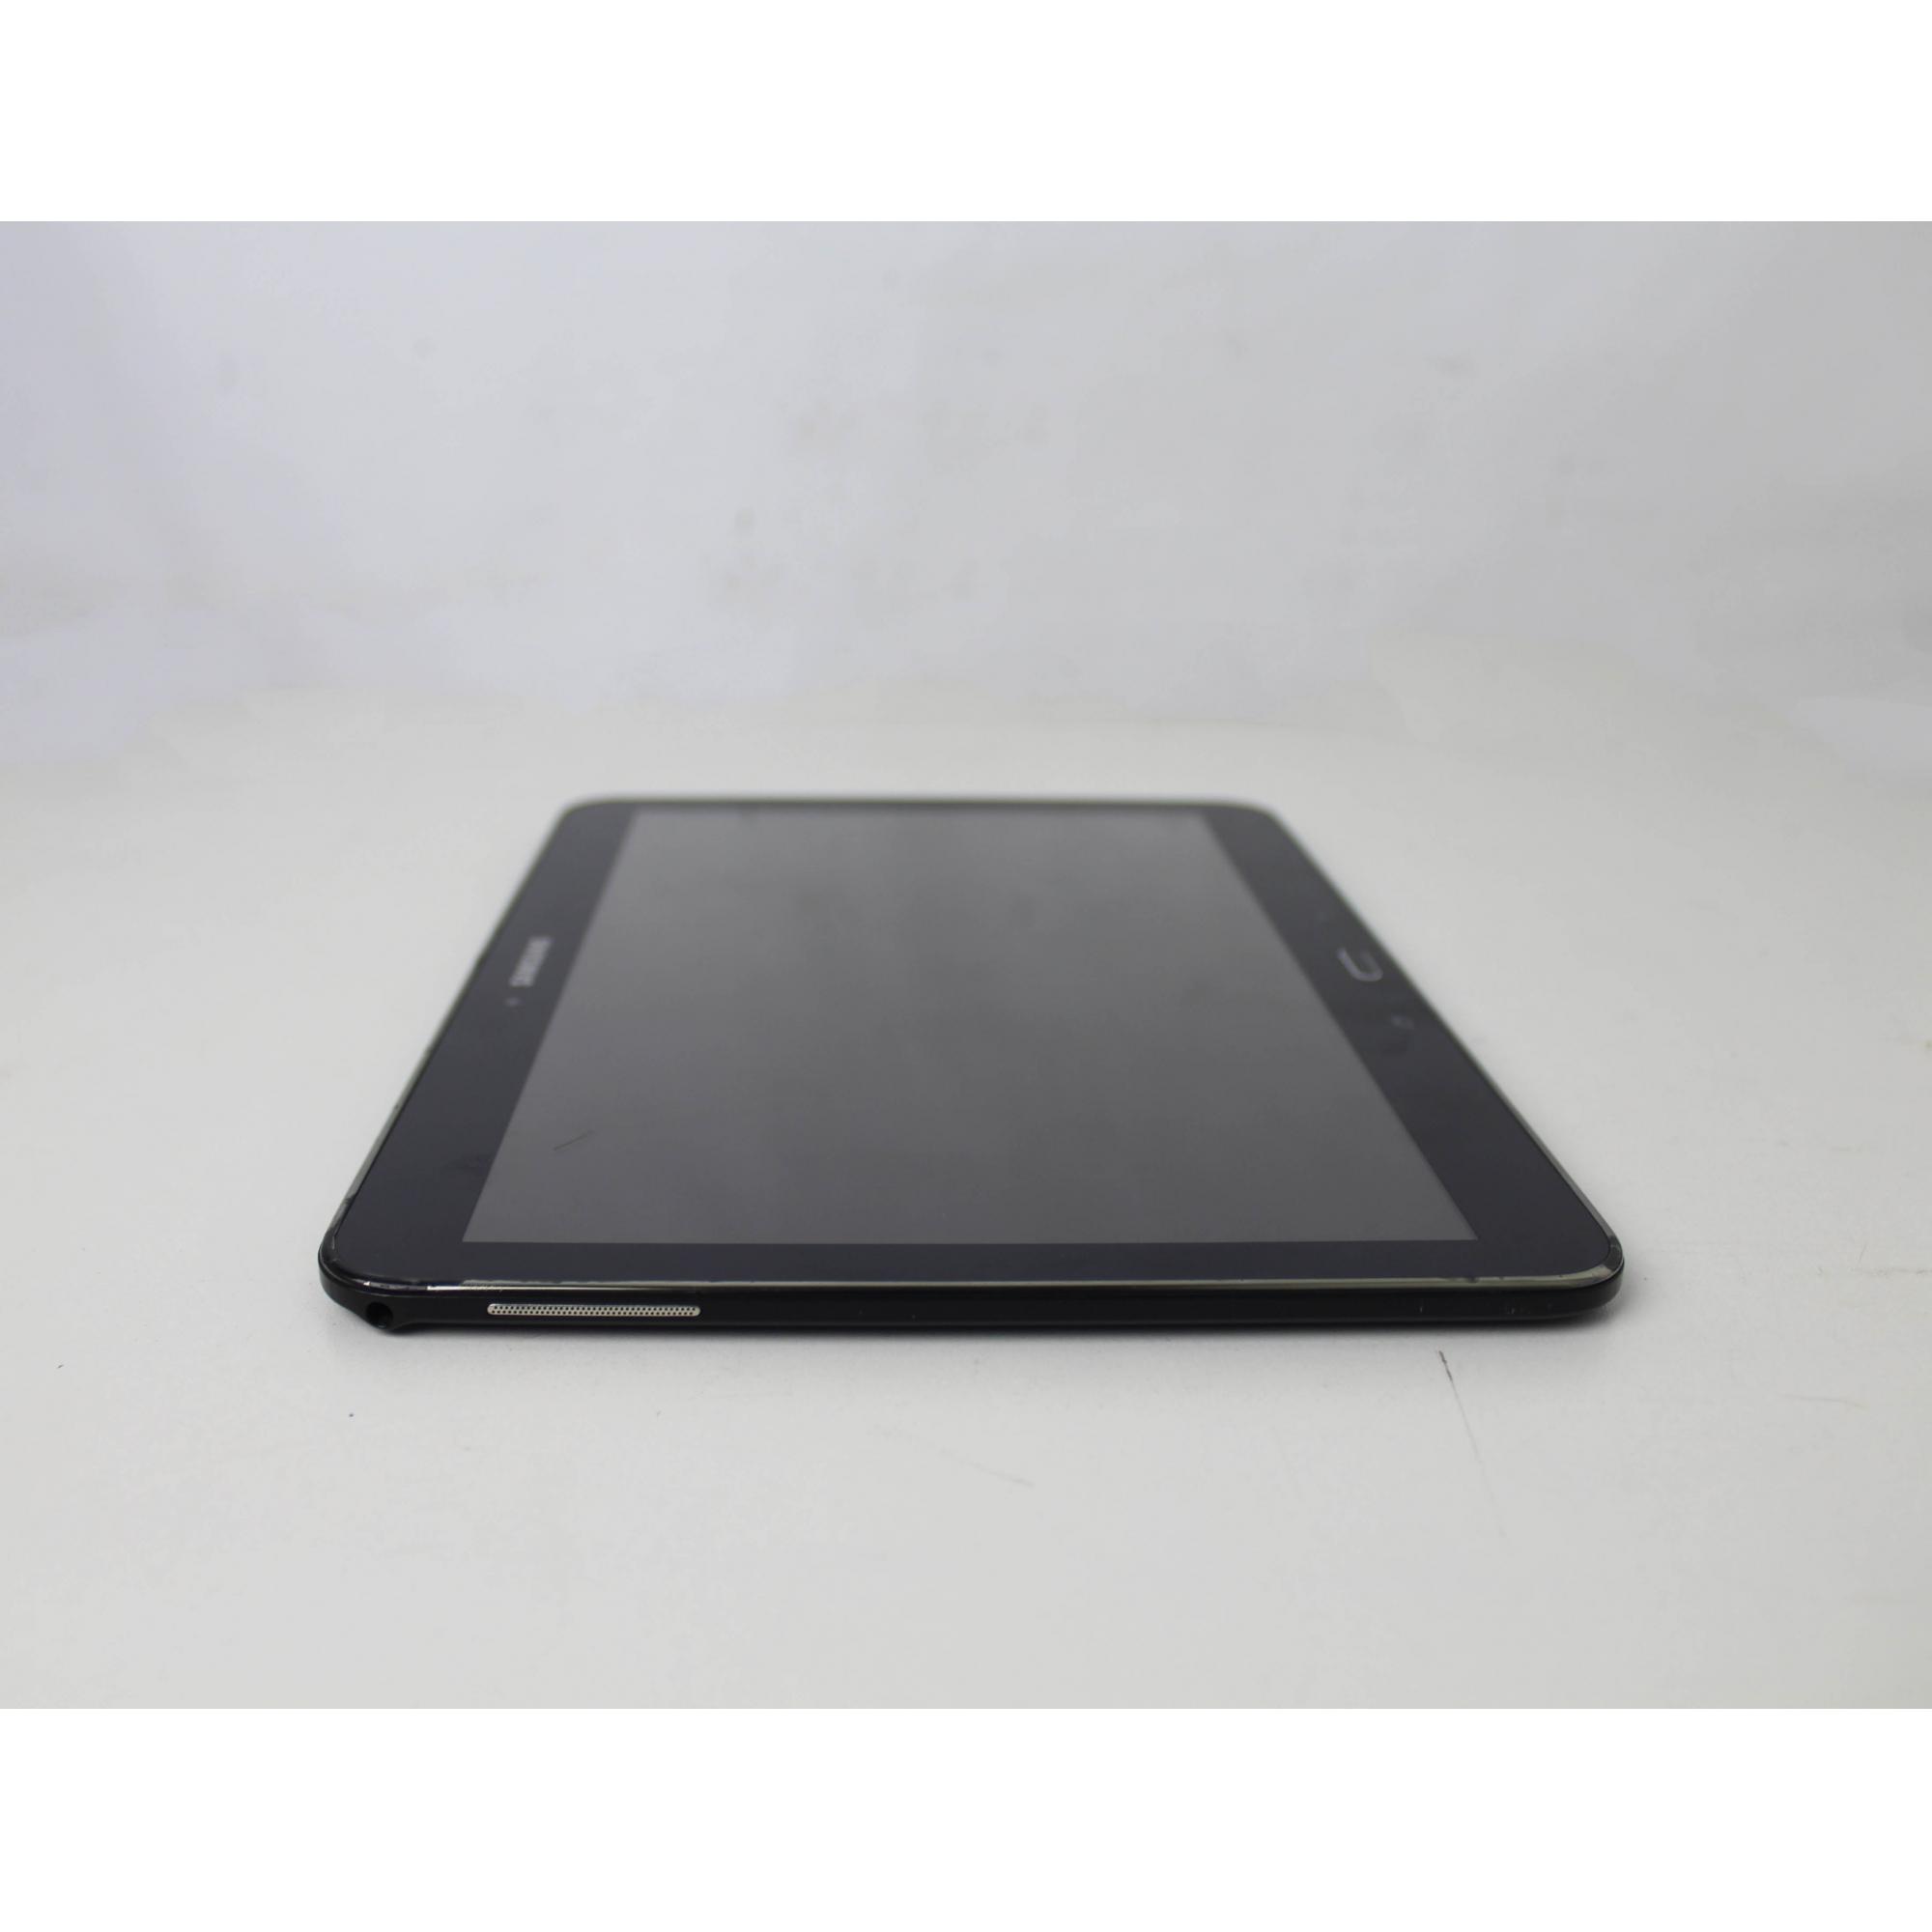 "TABLET SAMSUNG GALAXY TAB 4 SM-T530 10.1"" 16GB - WIFI (PRETO)"